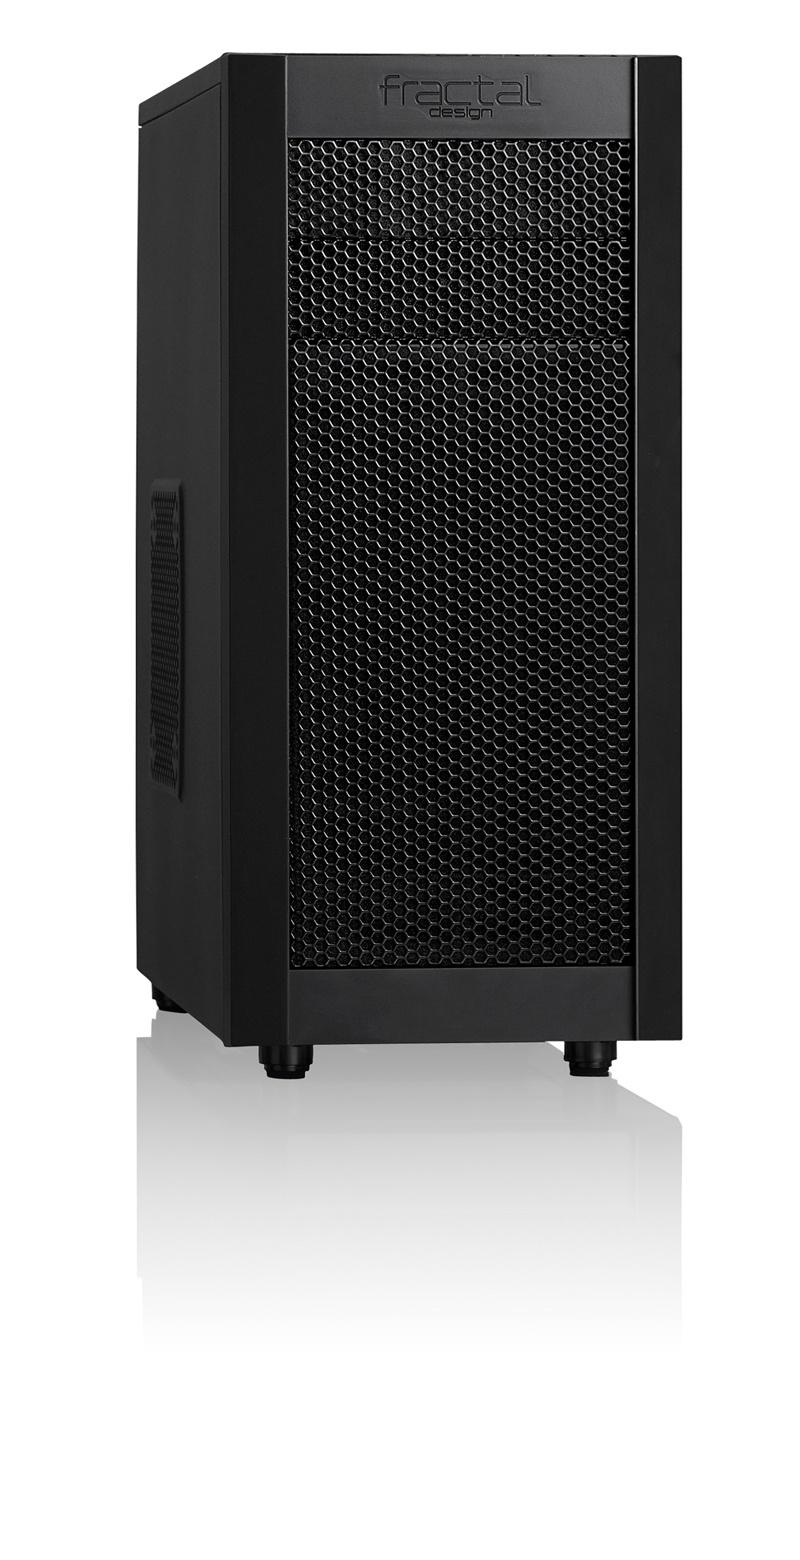 fractal design core 3000 usb 3 0 alternatieven tweakers. Black Bedroom Furniture Sets. Home Design Ideas